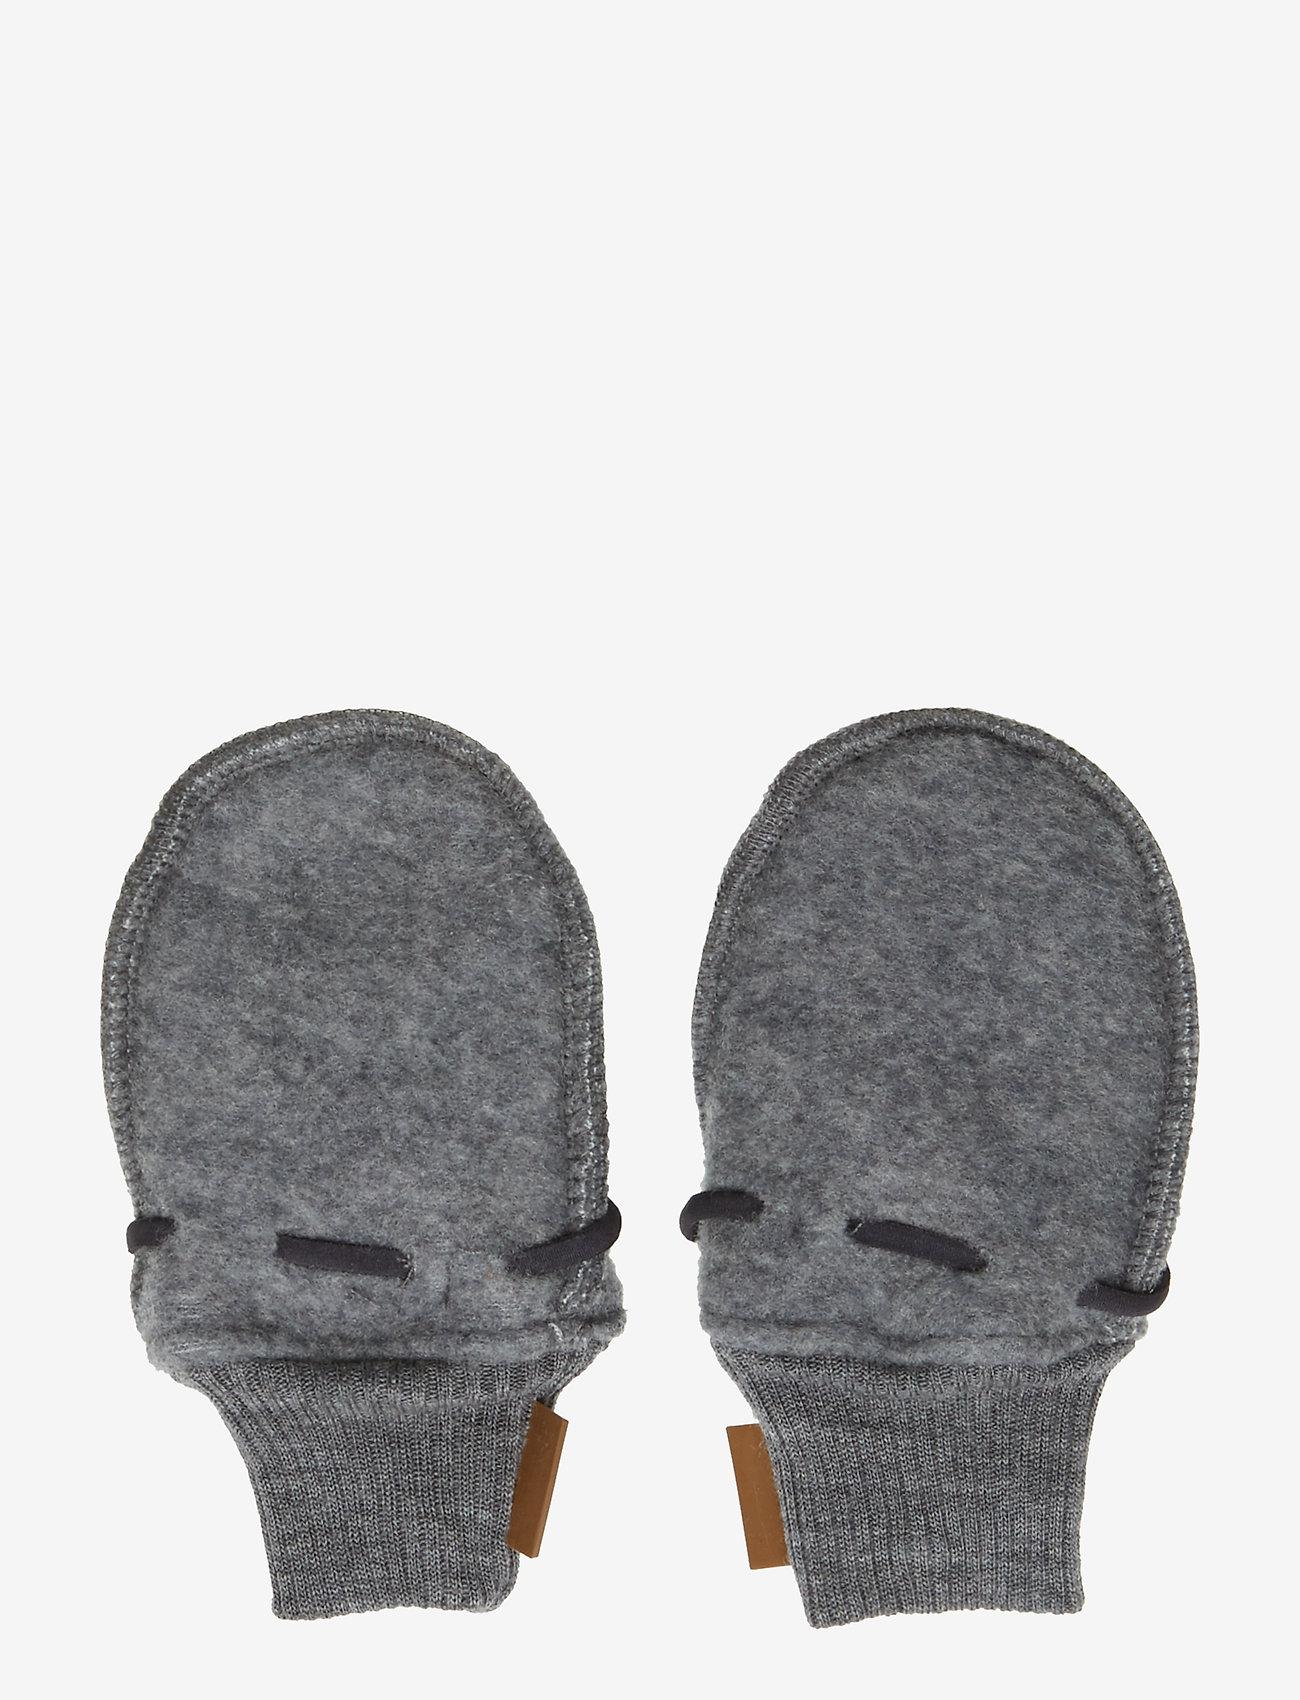 Mikk-Line - Wool mittens - vantar - 916/melangegrey - 1